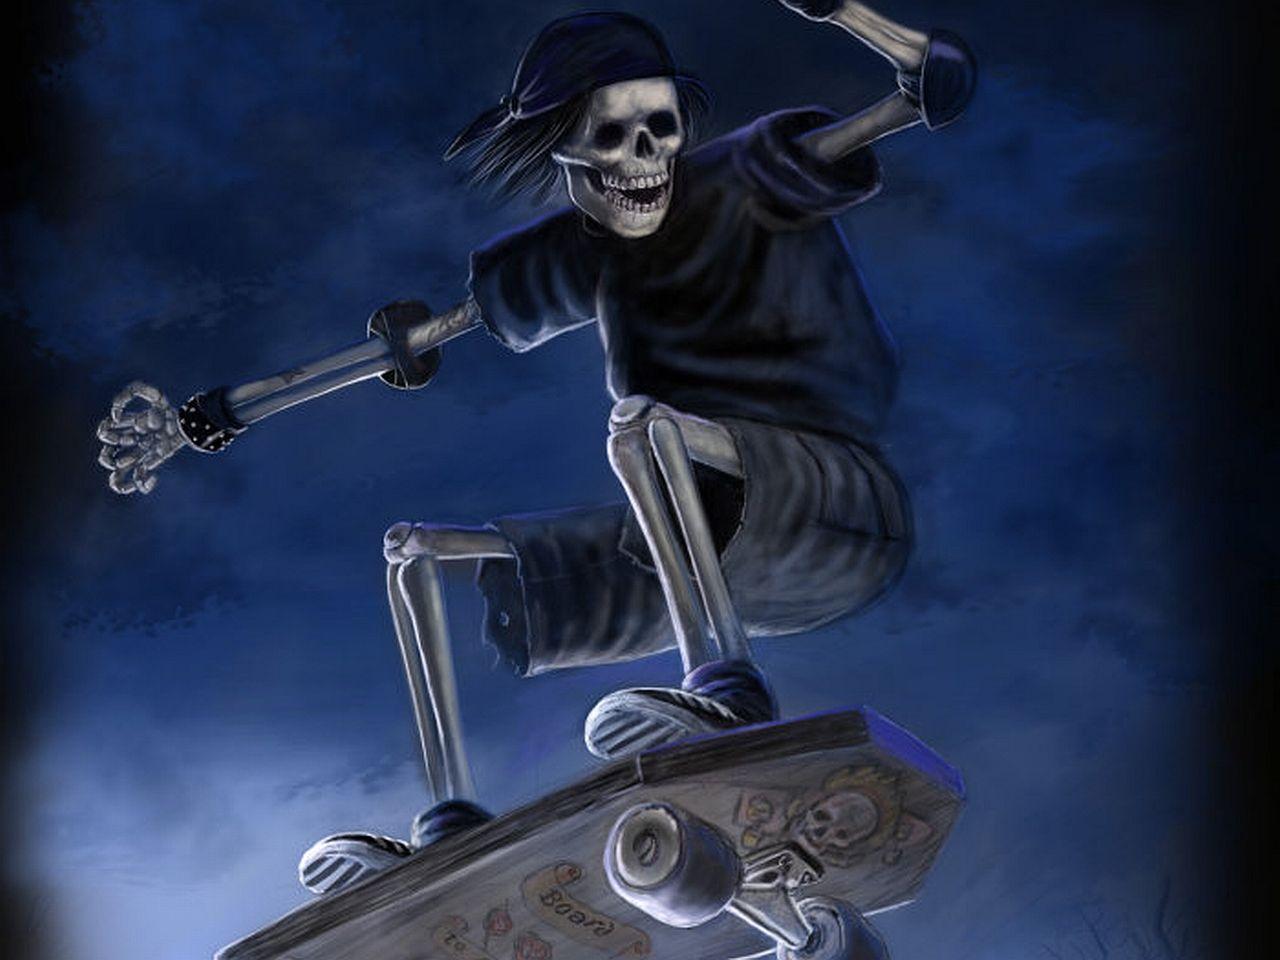 Cool skeleton wallpapers wallpaper cave - Skeleton wallpaper ...